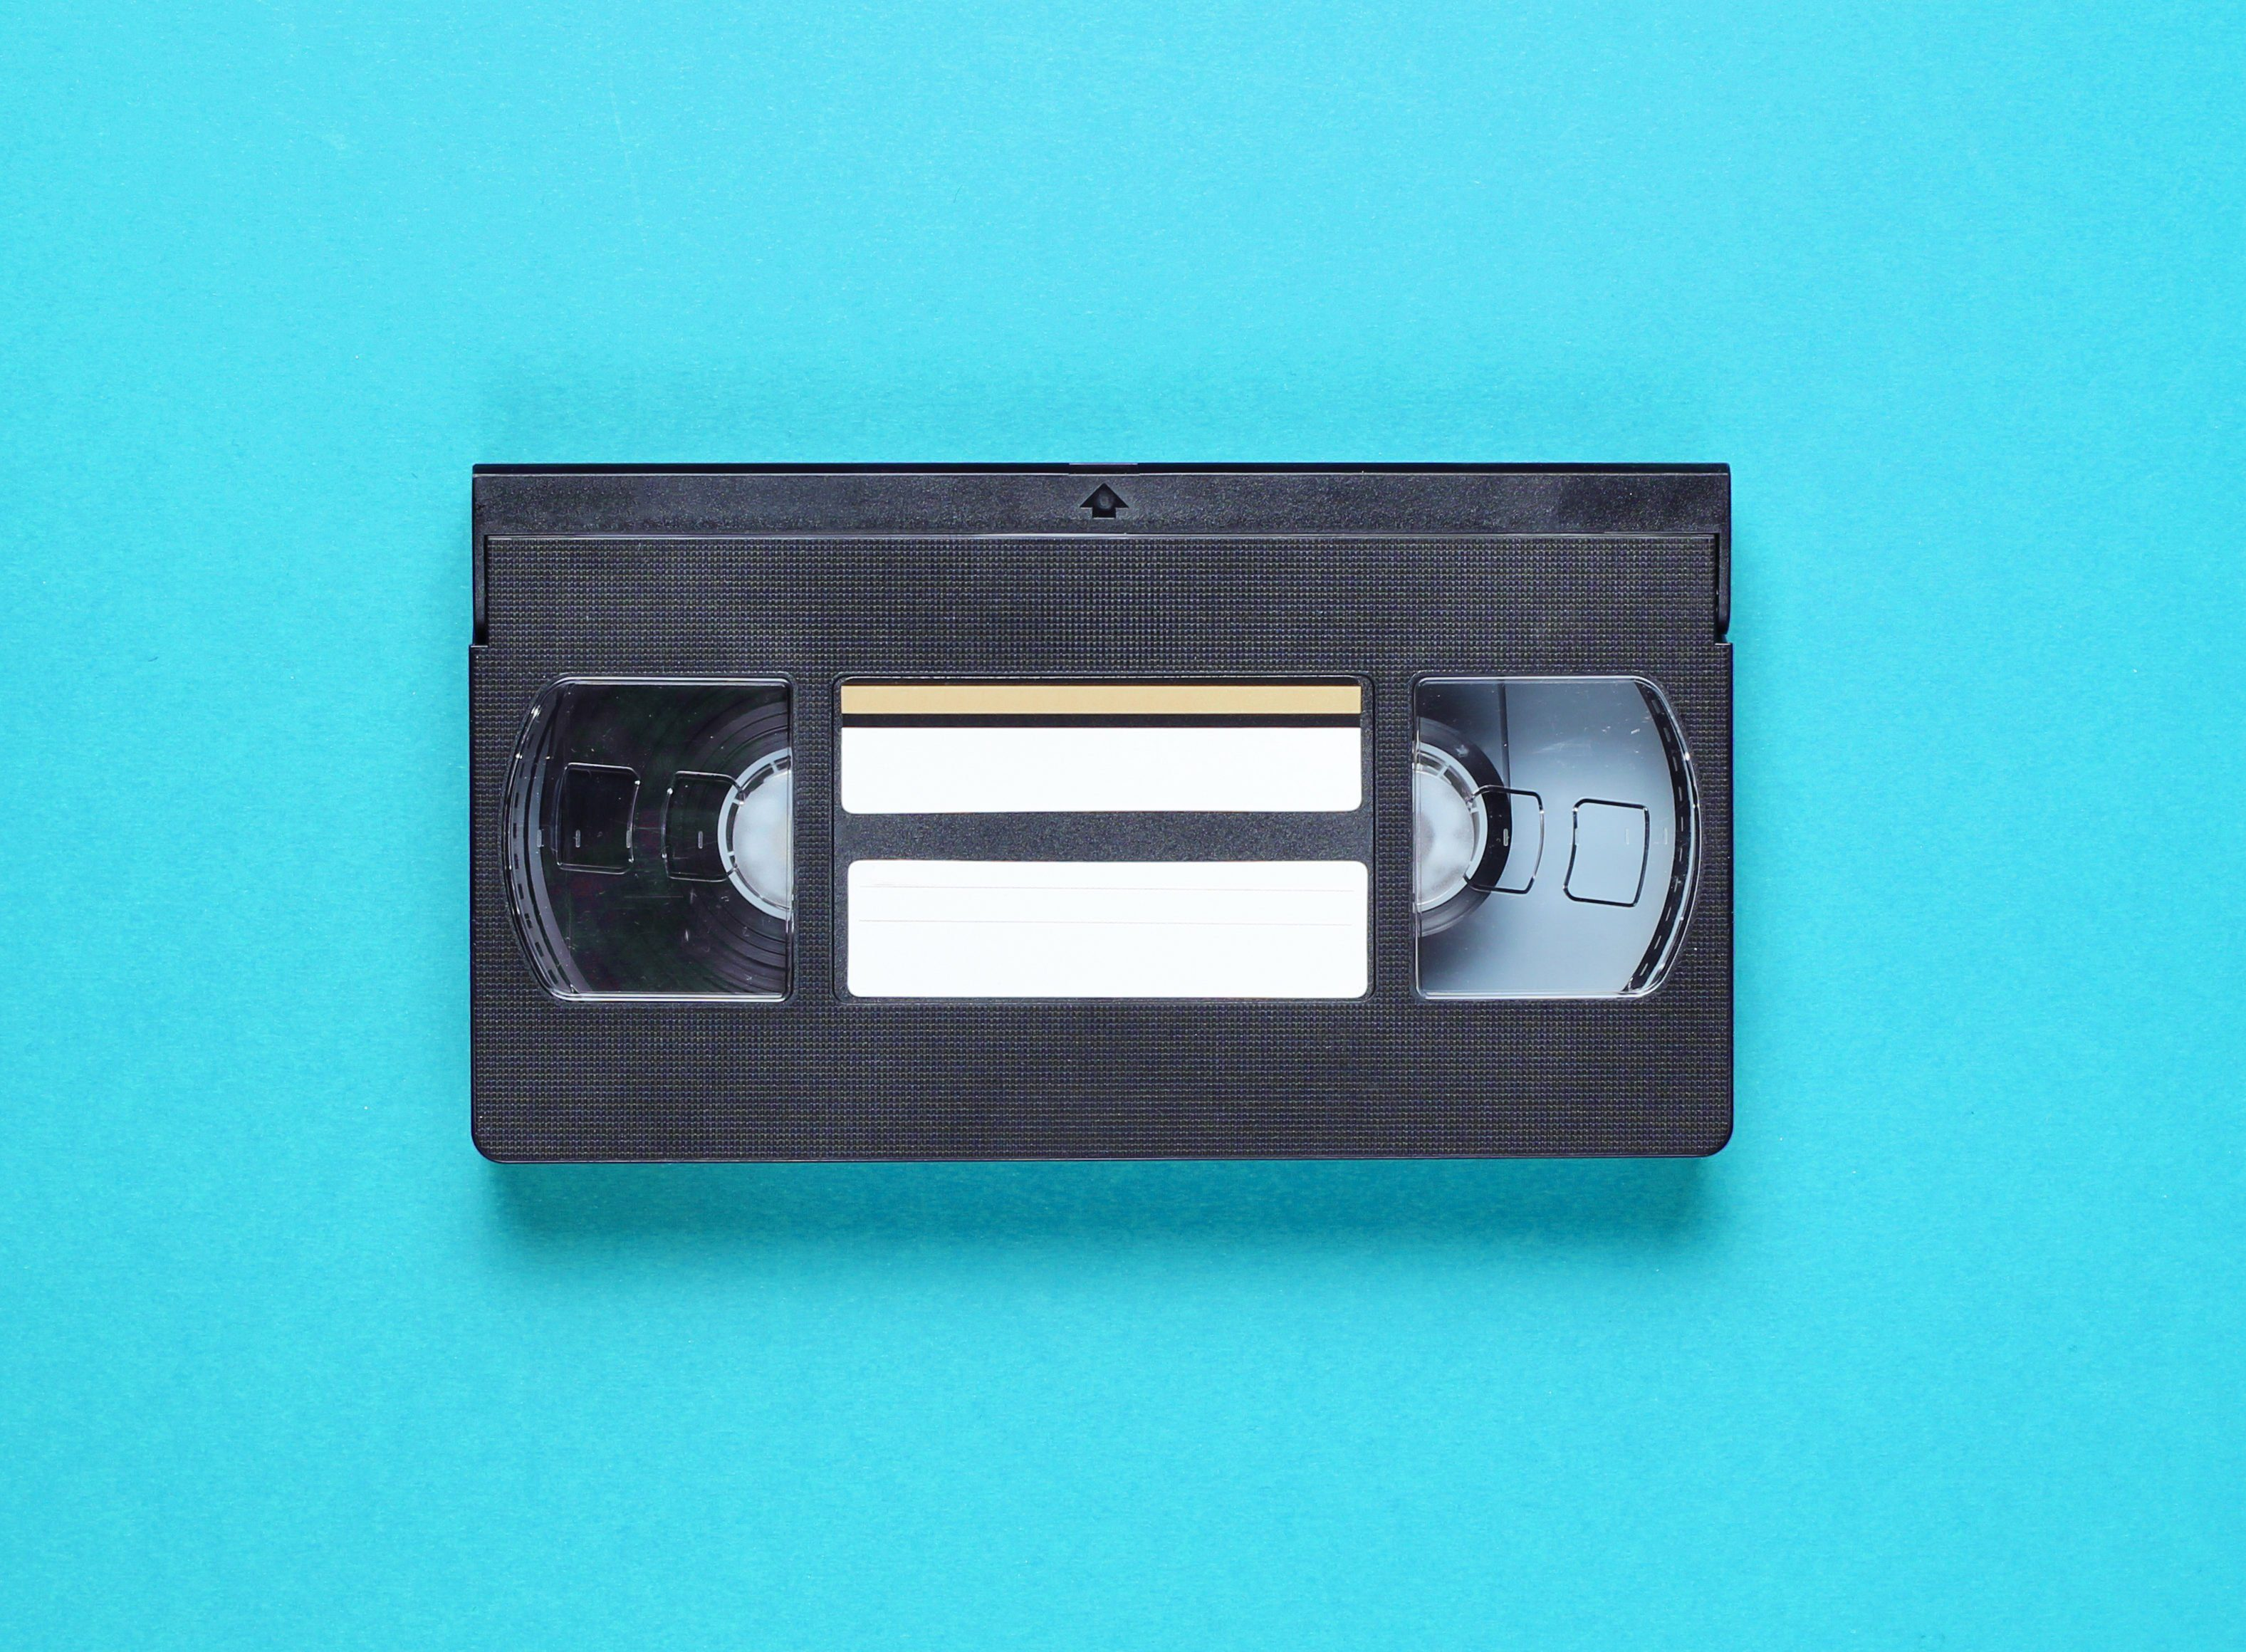 Pop culture retro attributes 80s, video cassette on blue background. Top view